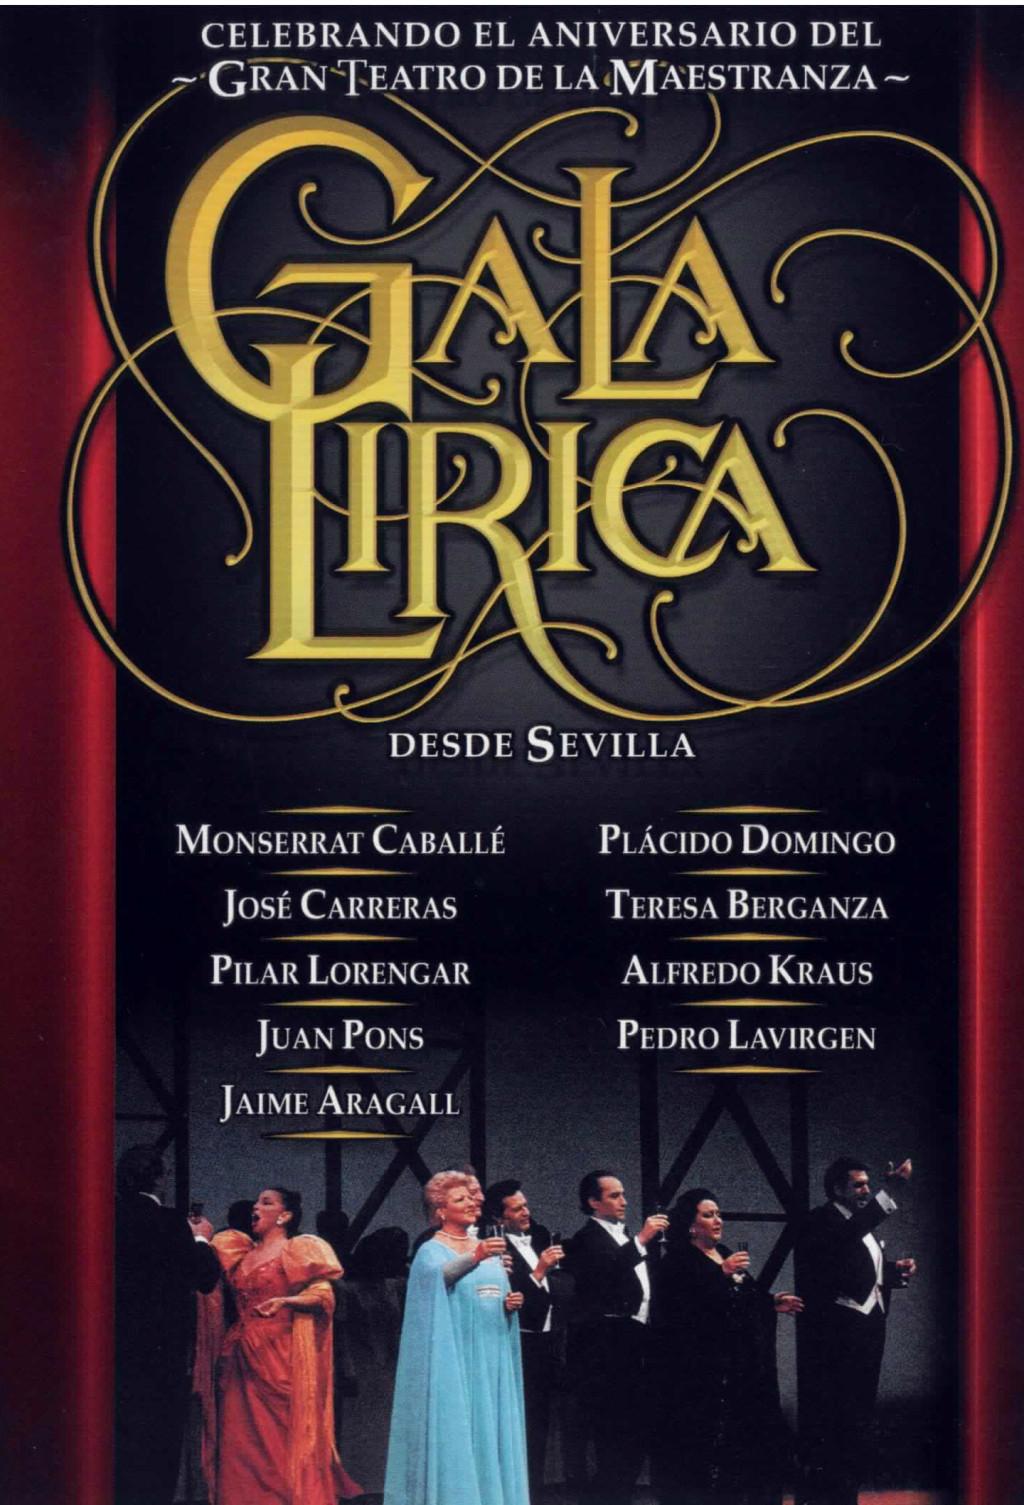 GALA-LIRICA-Desde-Sevilla-CD-DVD-NEW-Caballe-Domingo-Carreras-Aragall